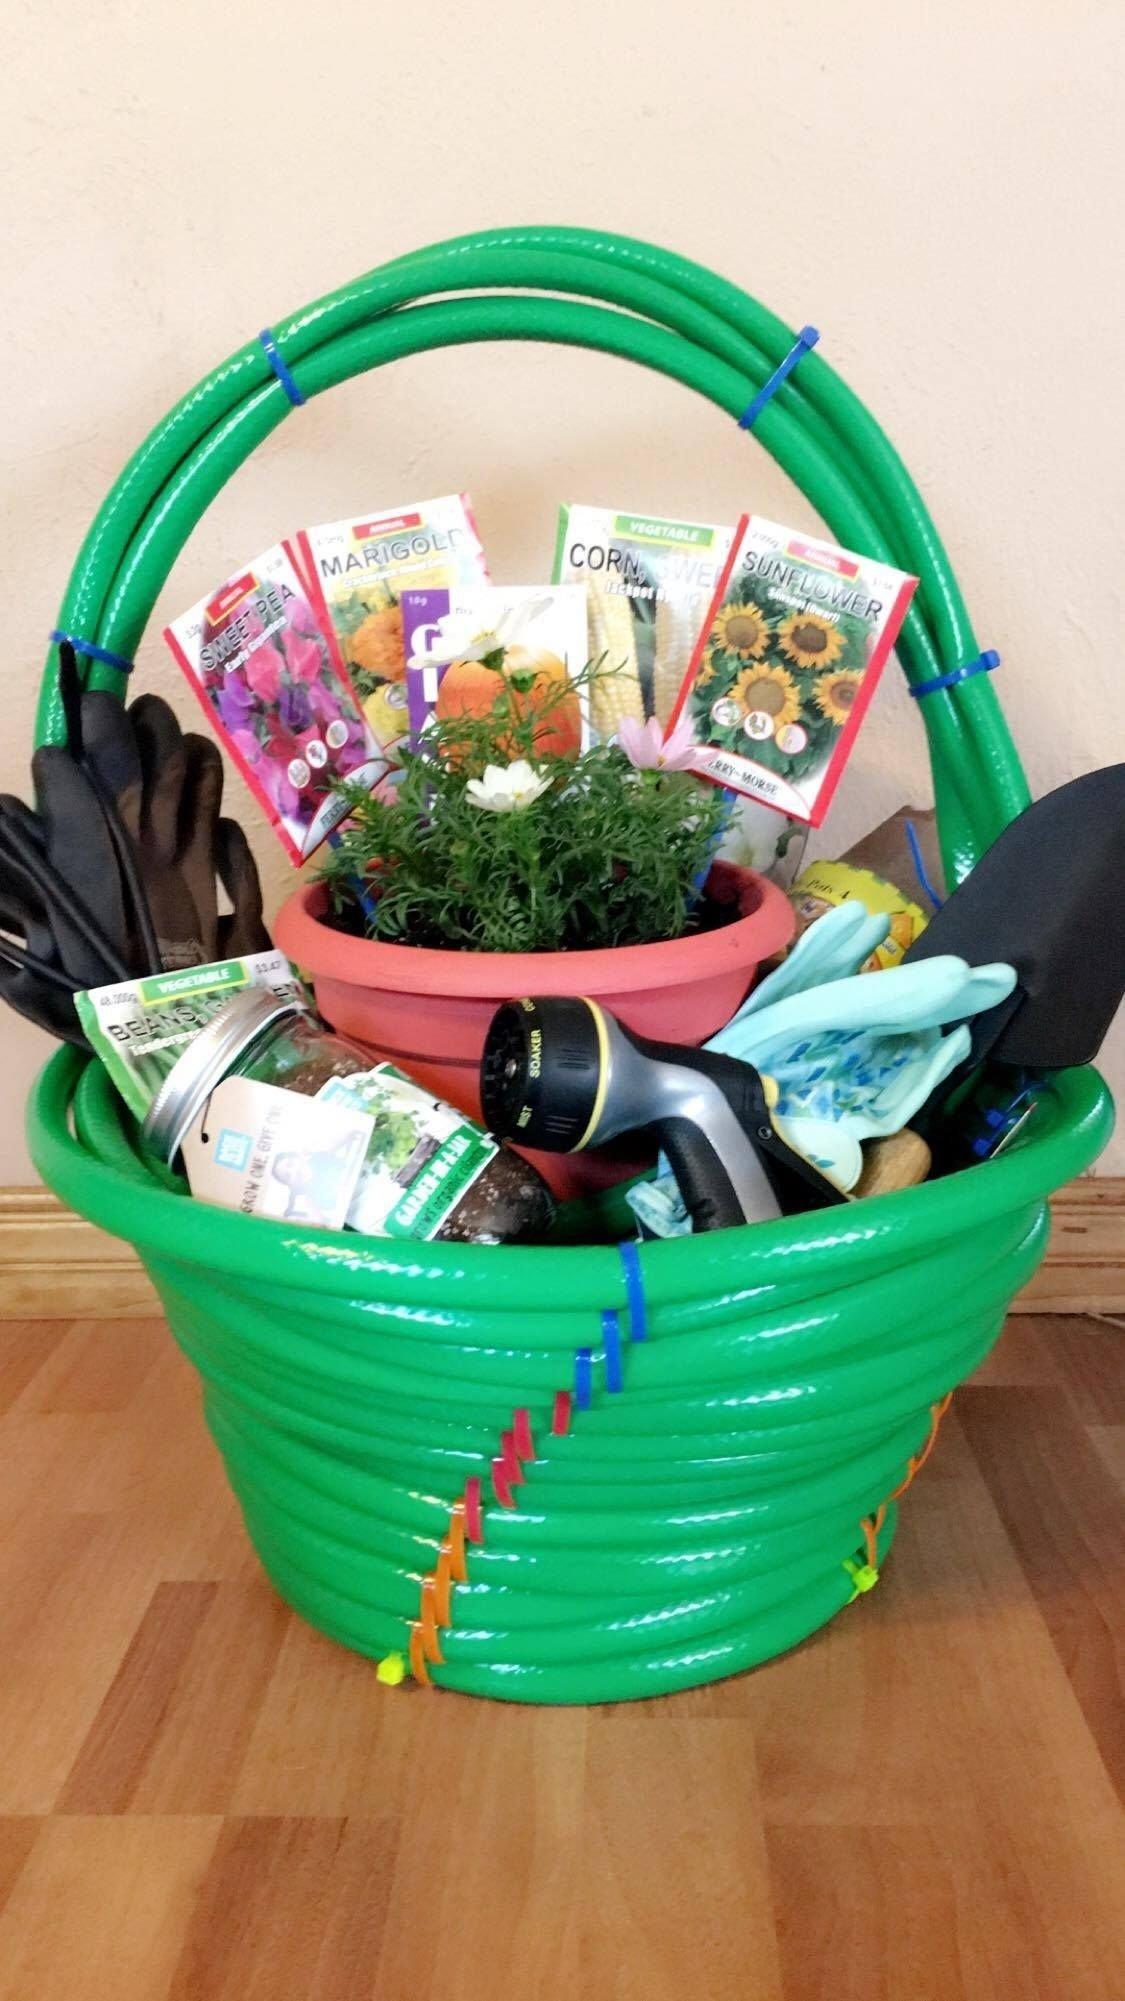 10 Cute Theme Basket Ideas For Silent Auction garden themed silent auction basket themed gift baskets 2020